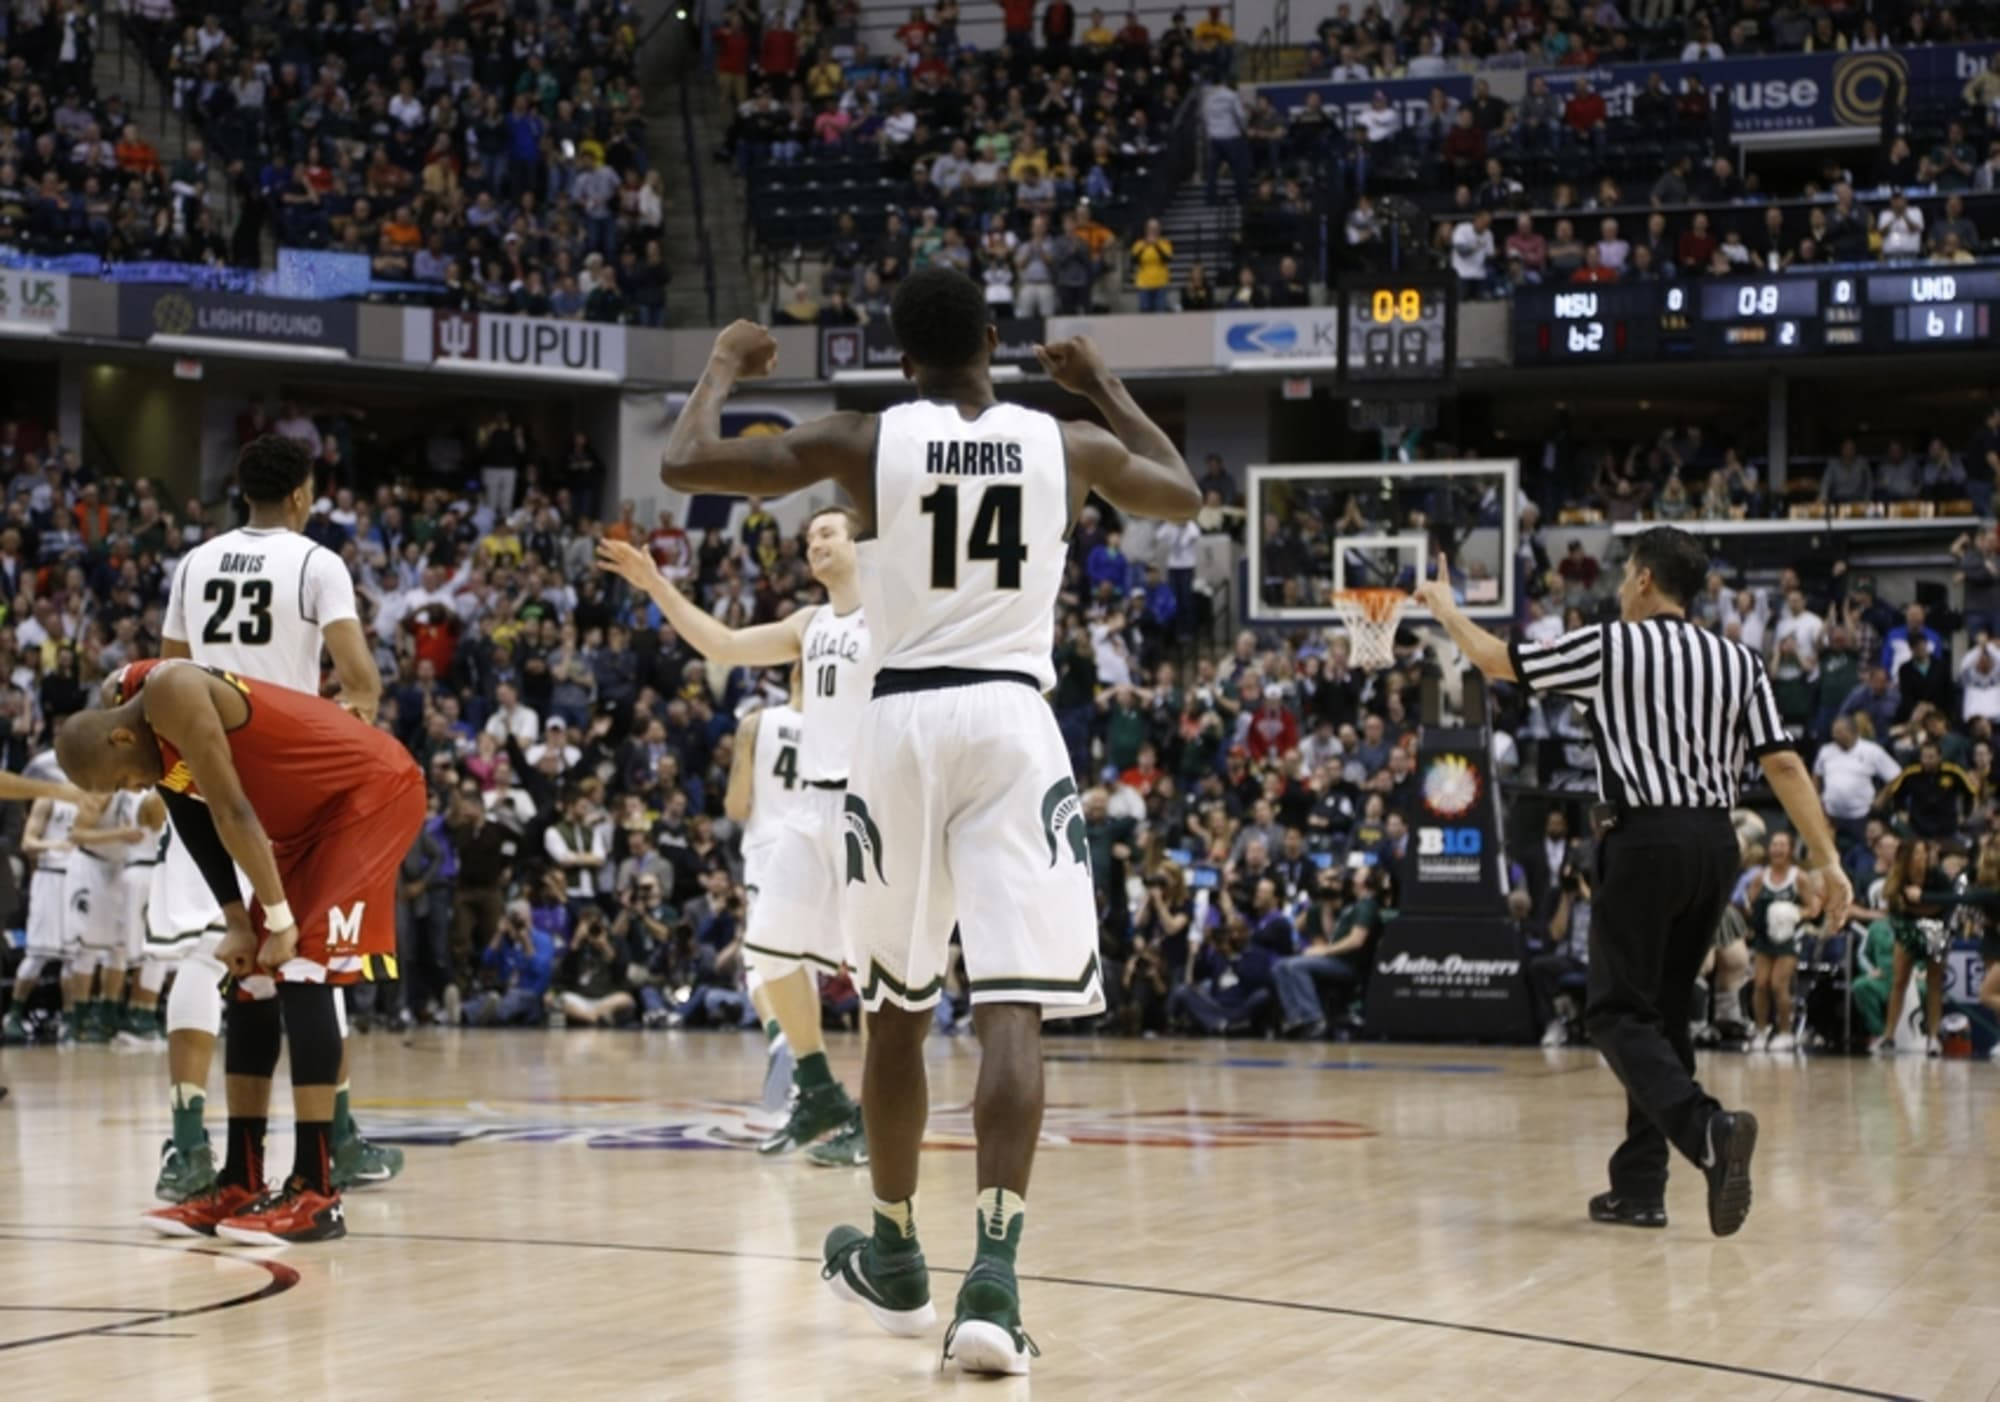 Michigan State vs Purdue live stream: Watch online